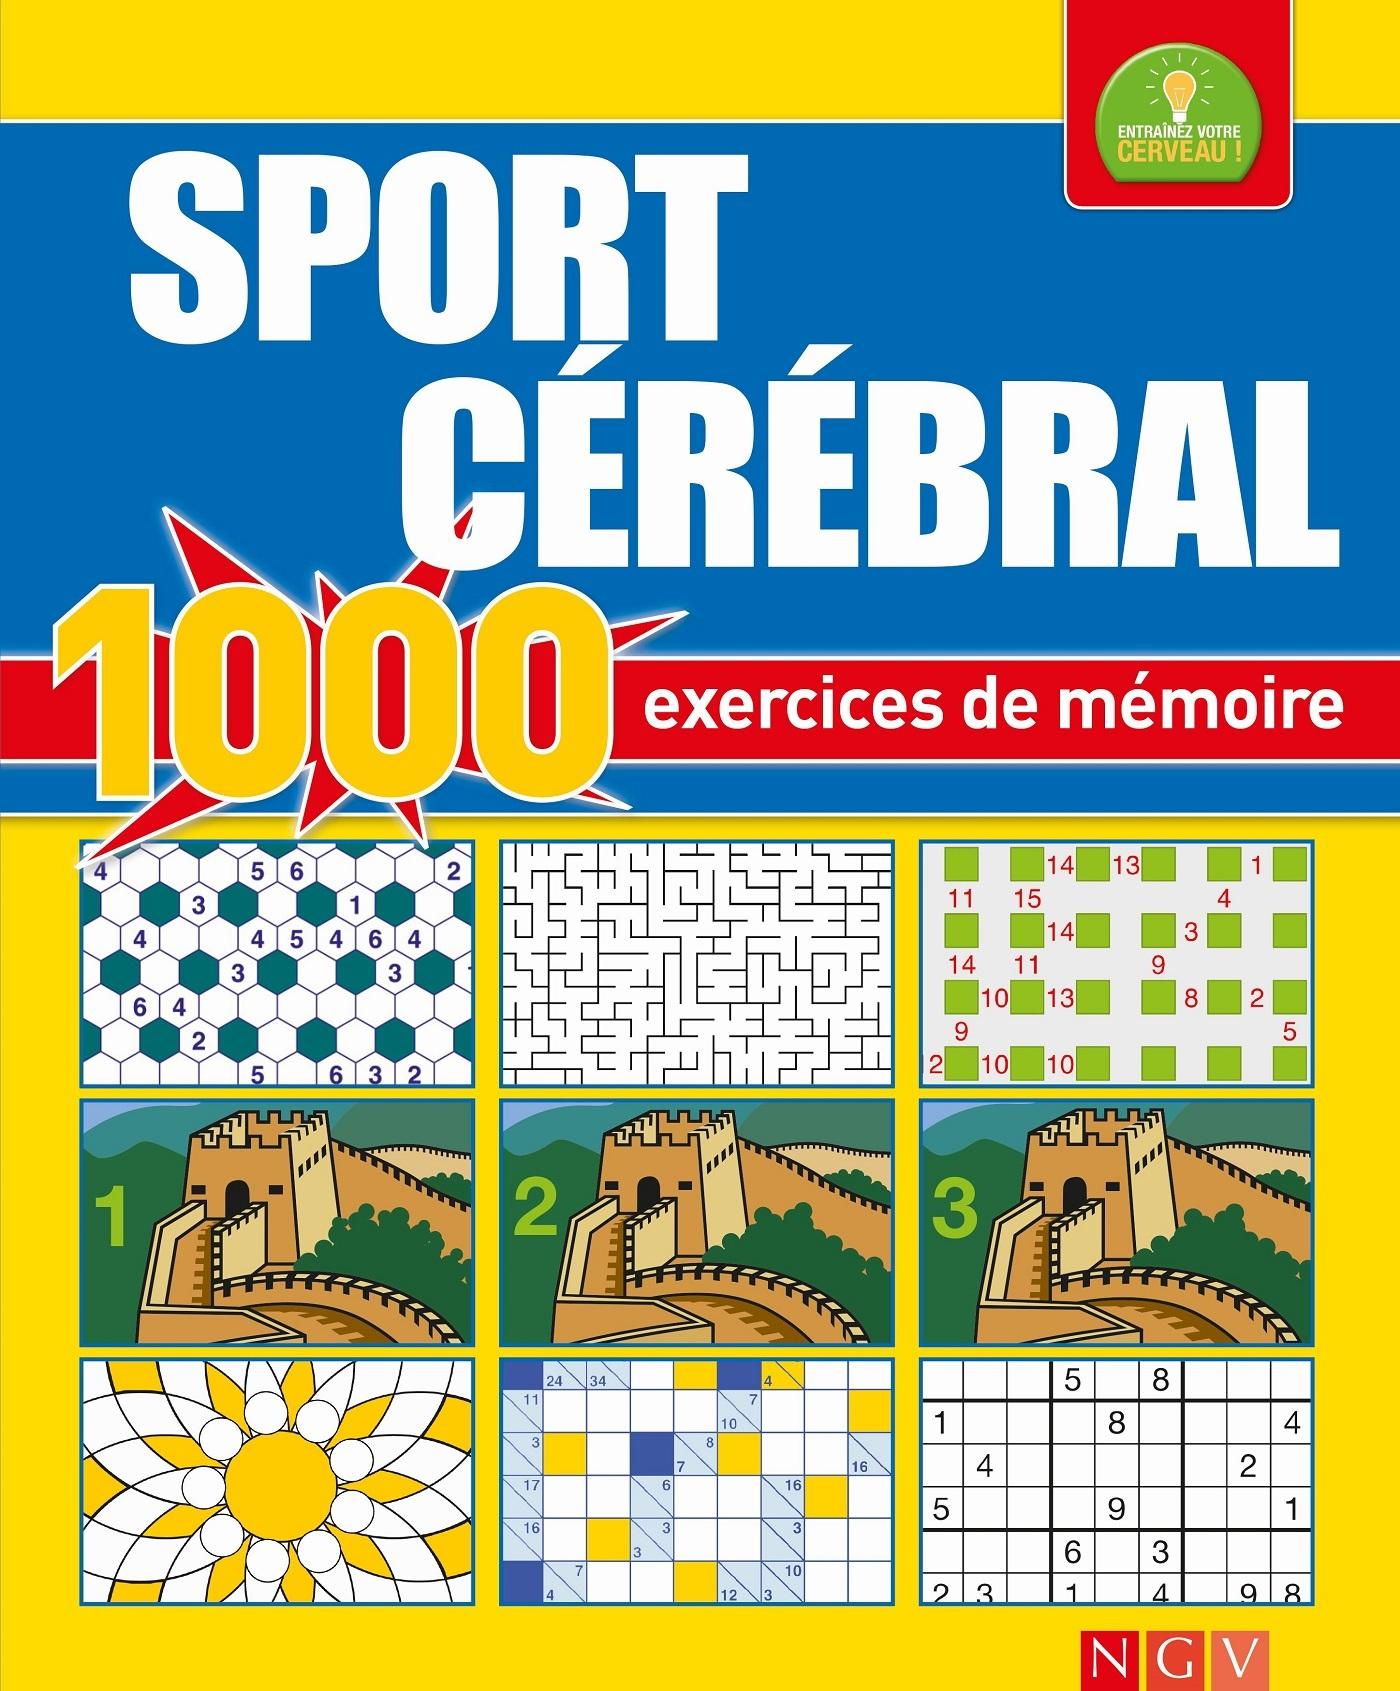 SPORT CEREBRAL - 1000 EXERCICES DE MEMOIRE